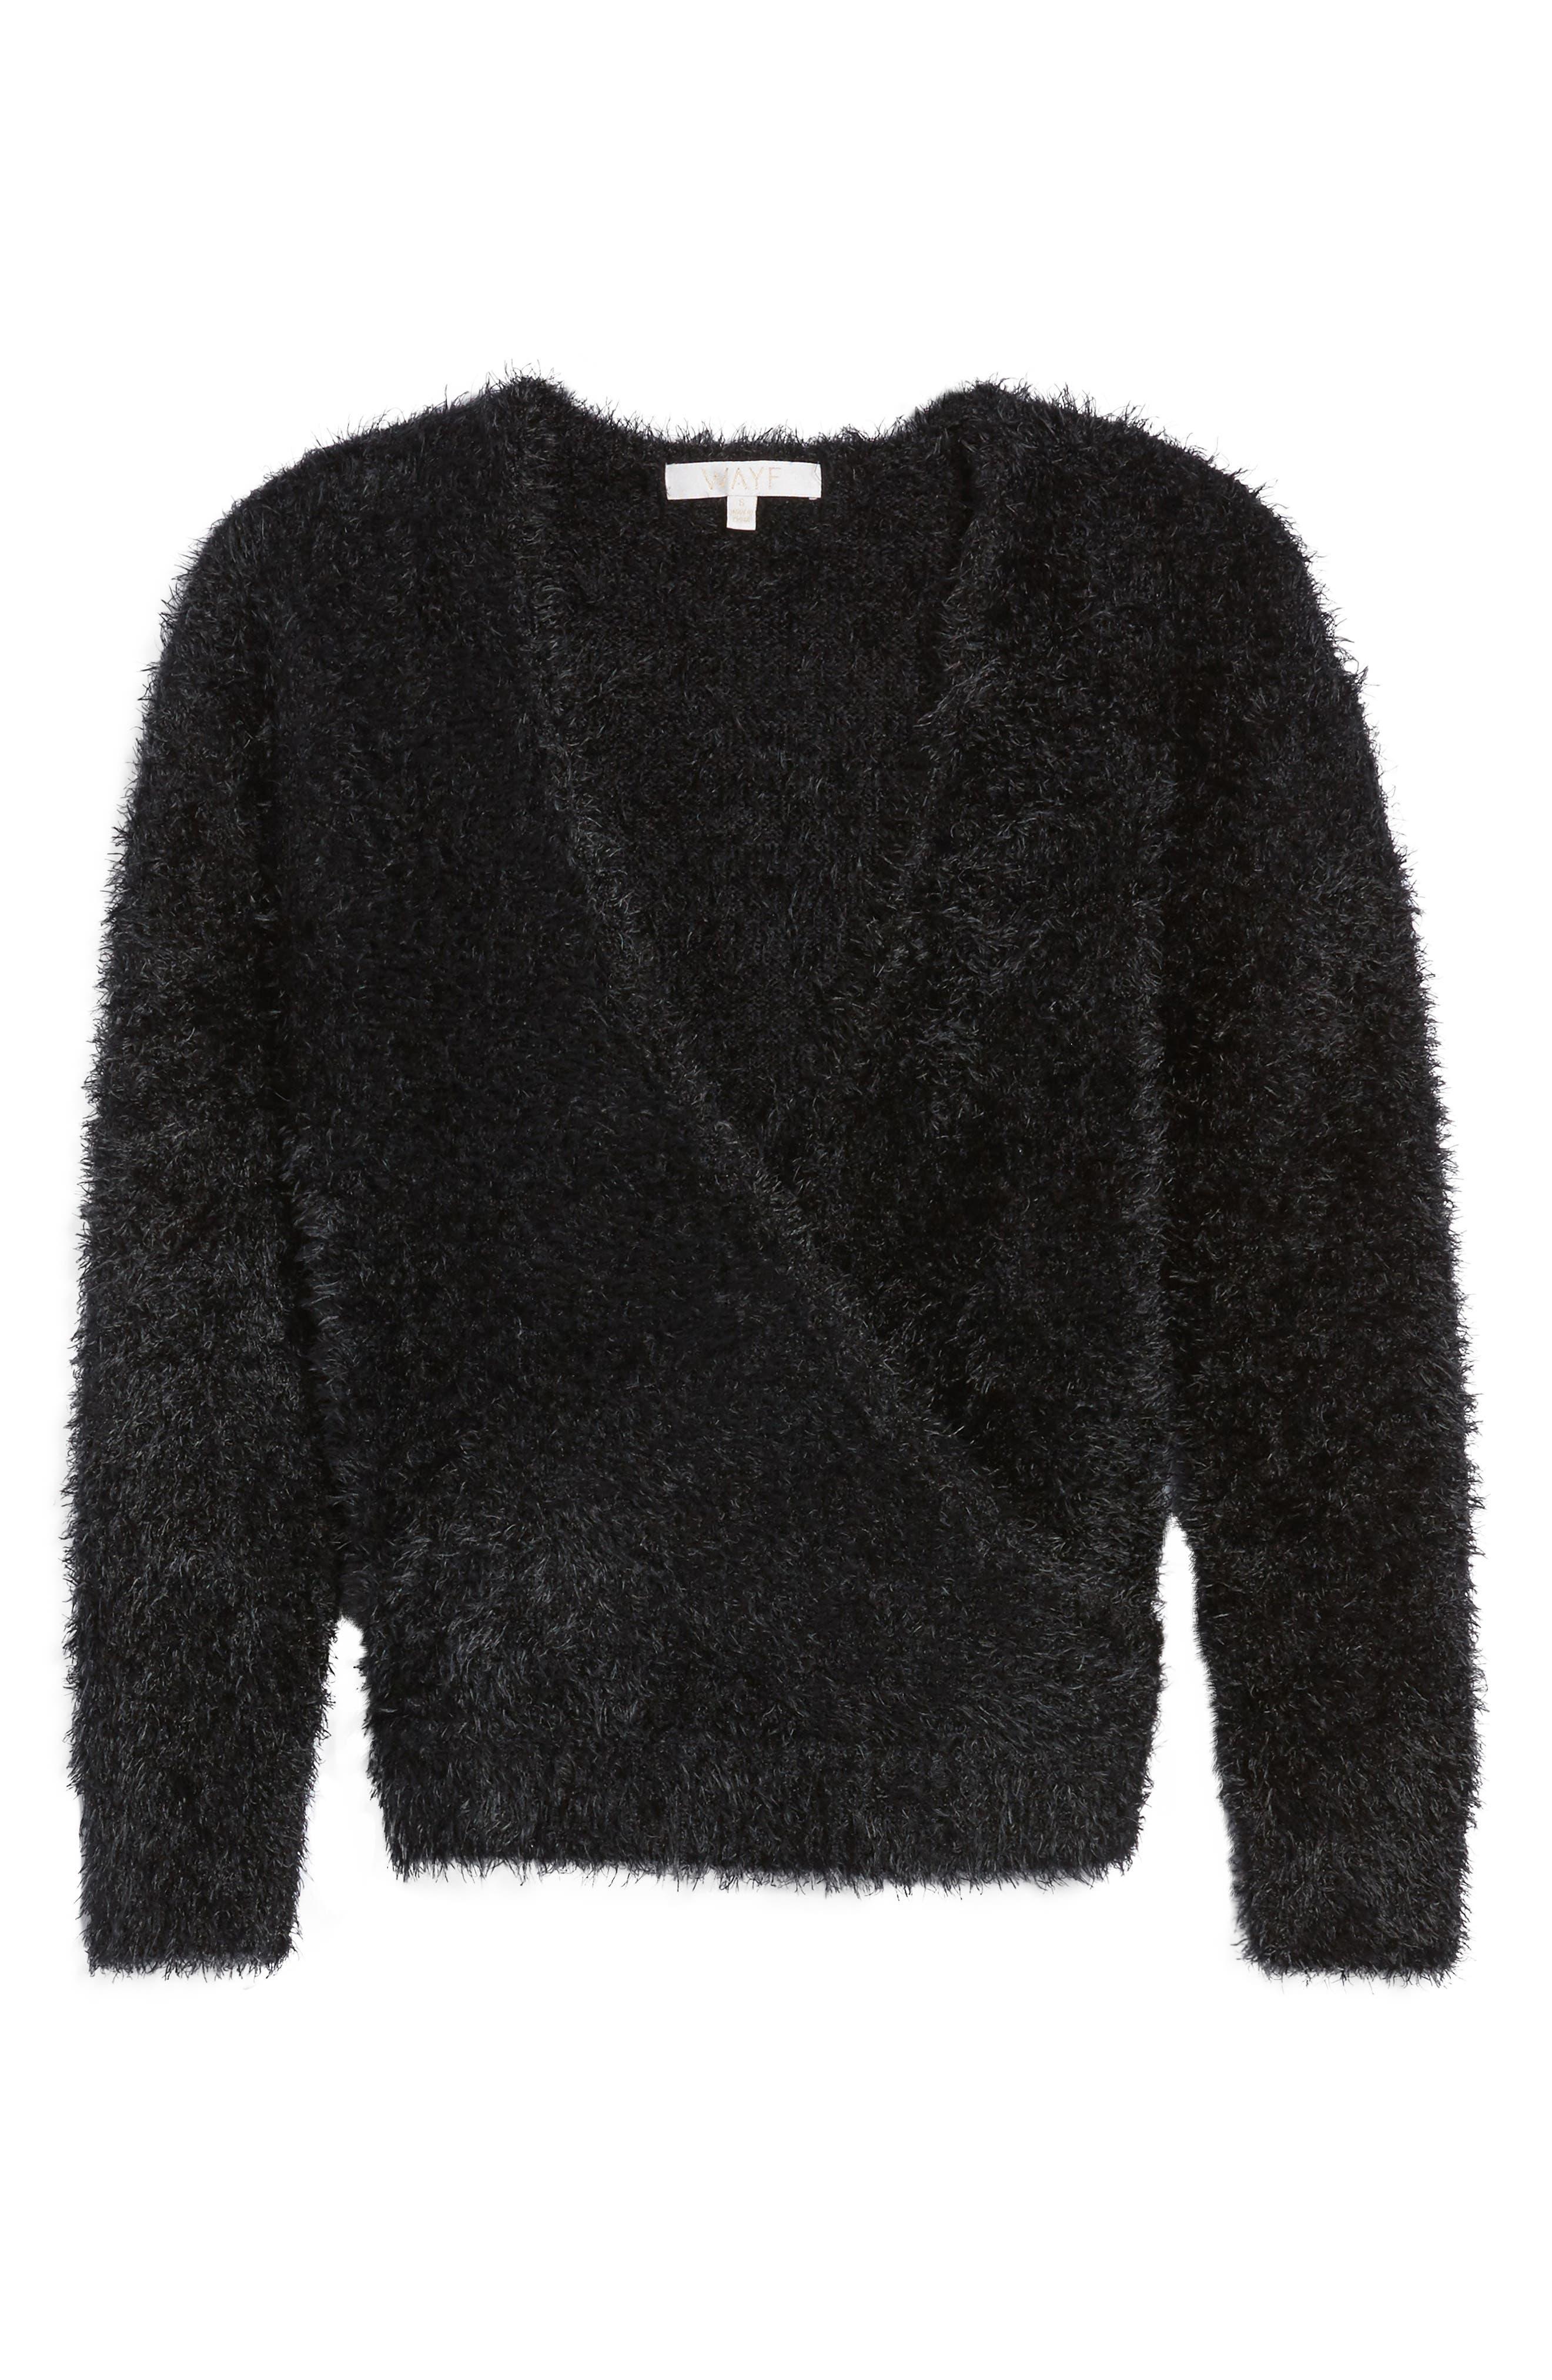 Fuzzy Surplice Sweater,                             Alternate thumbnail 6, color,                             001